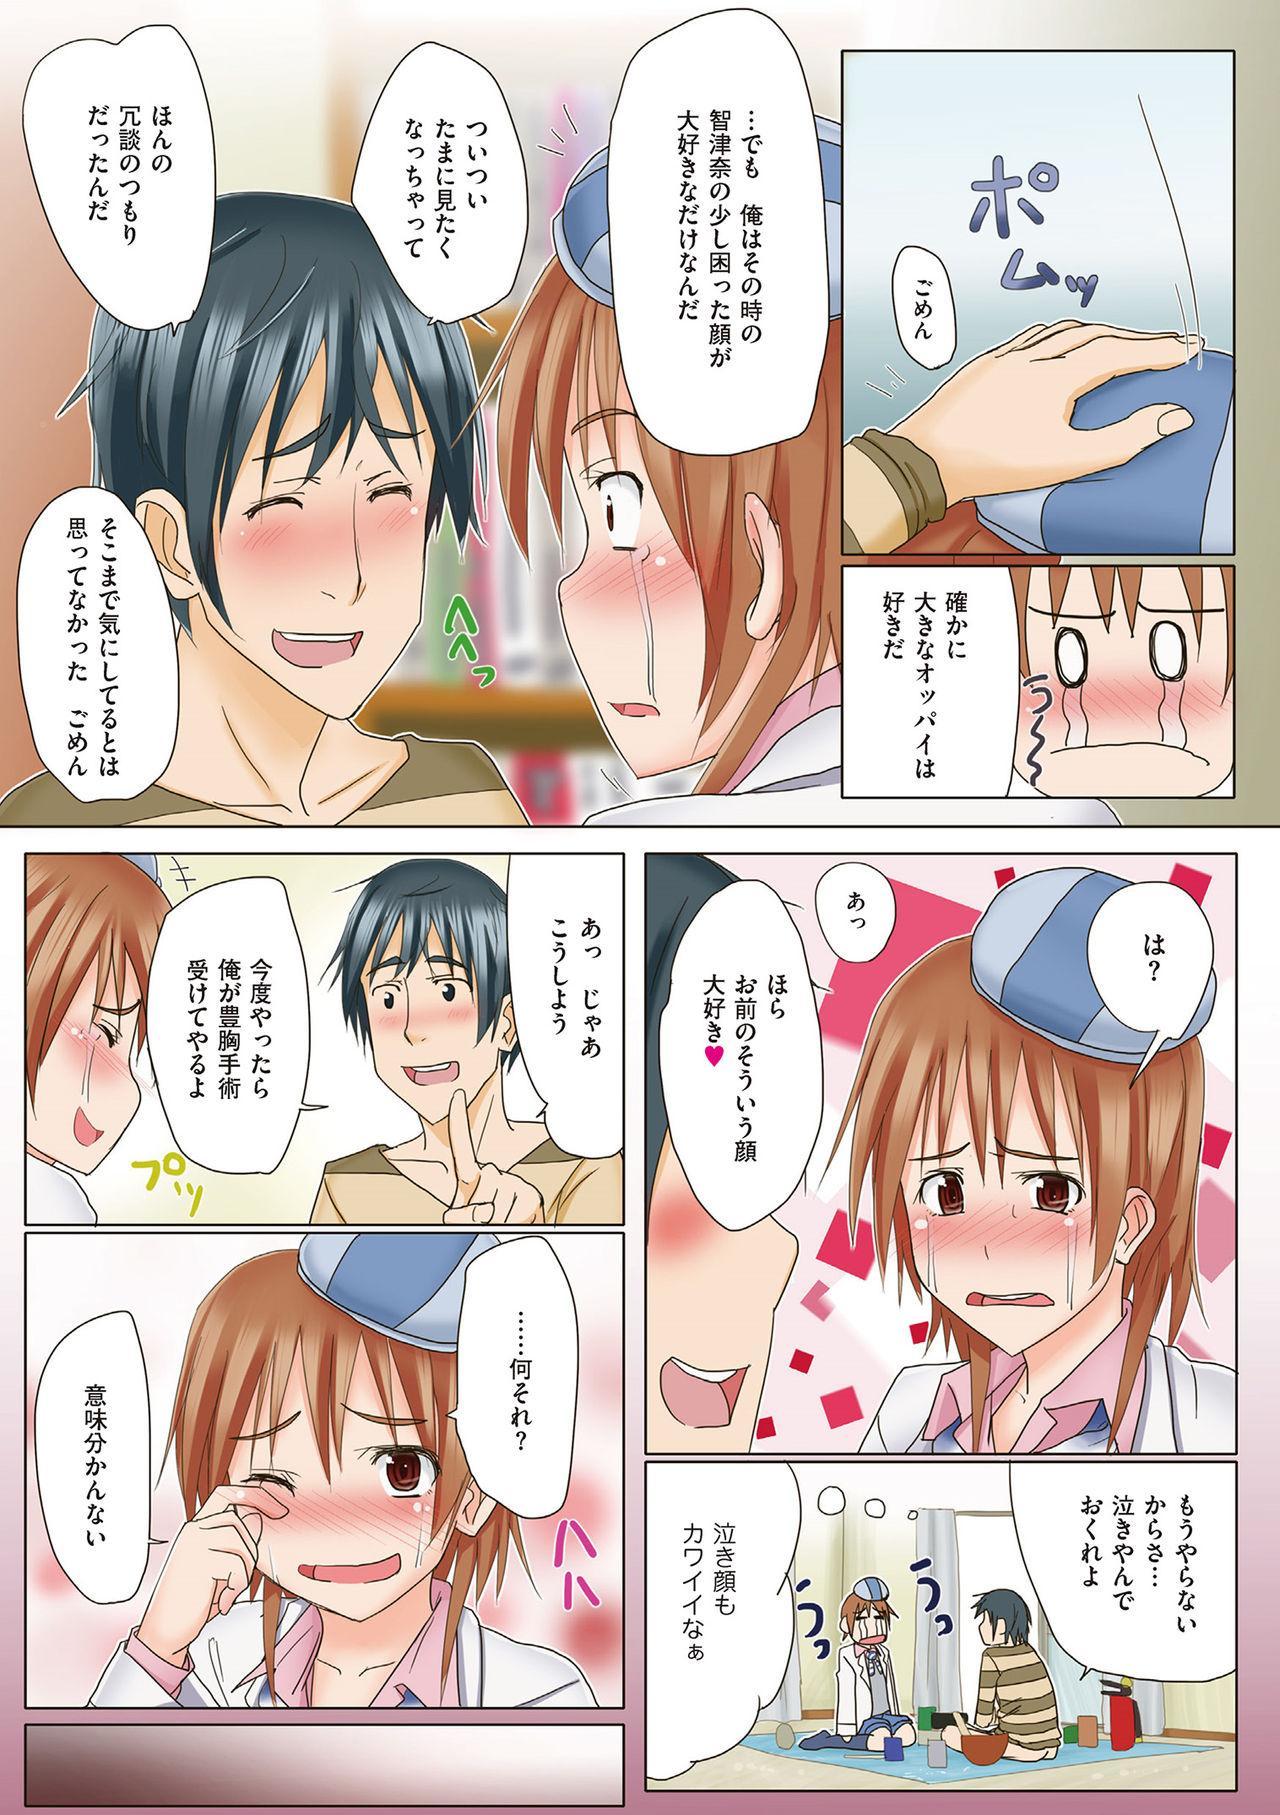 [Kosuke Haruhito] Are-zuki Kanojo - happy sexperience [Digital] 156